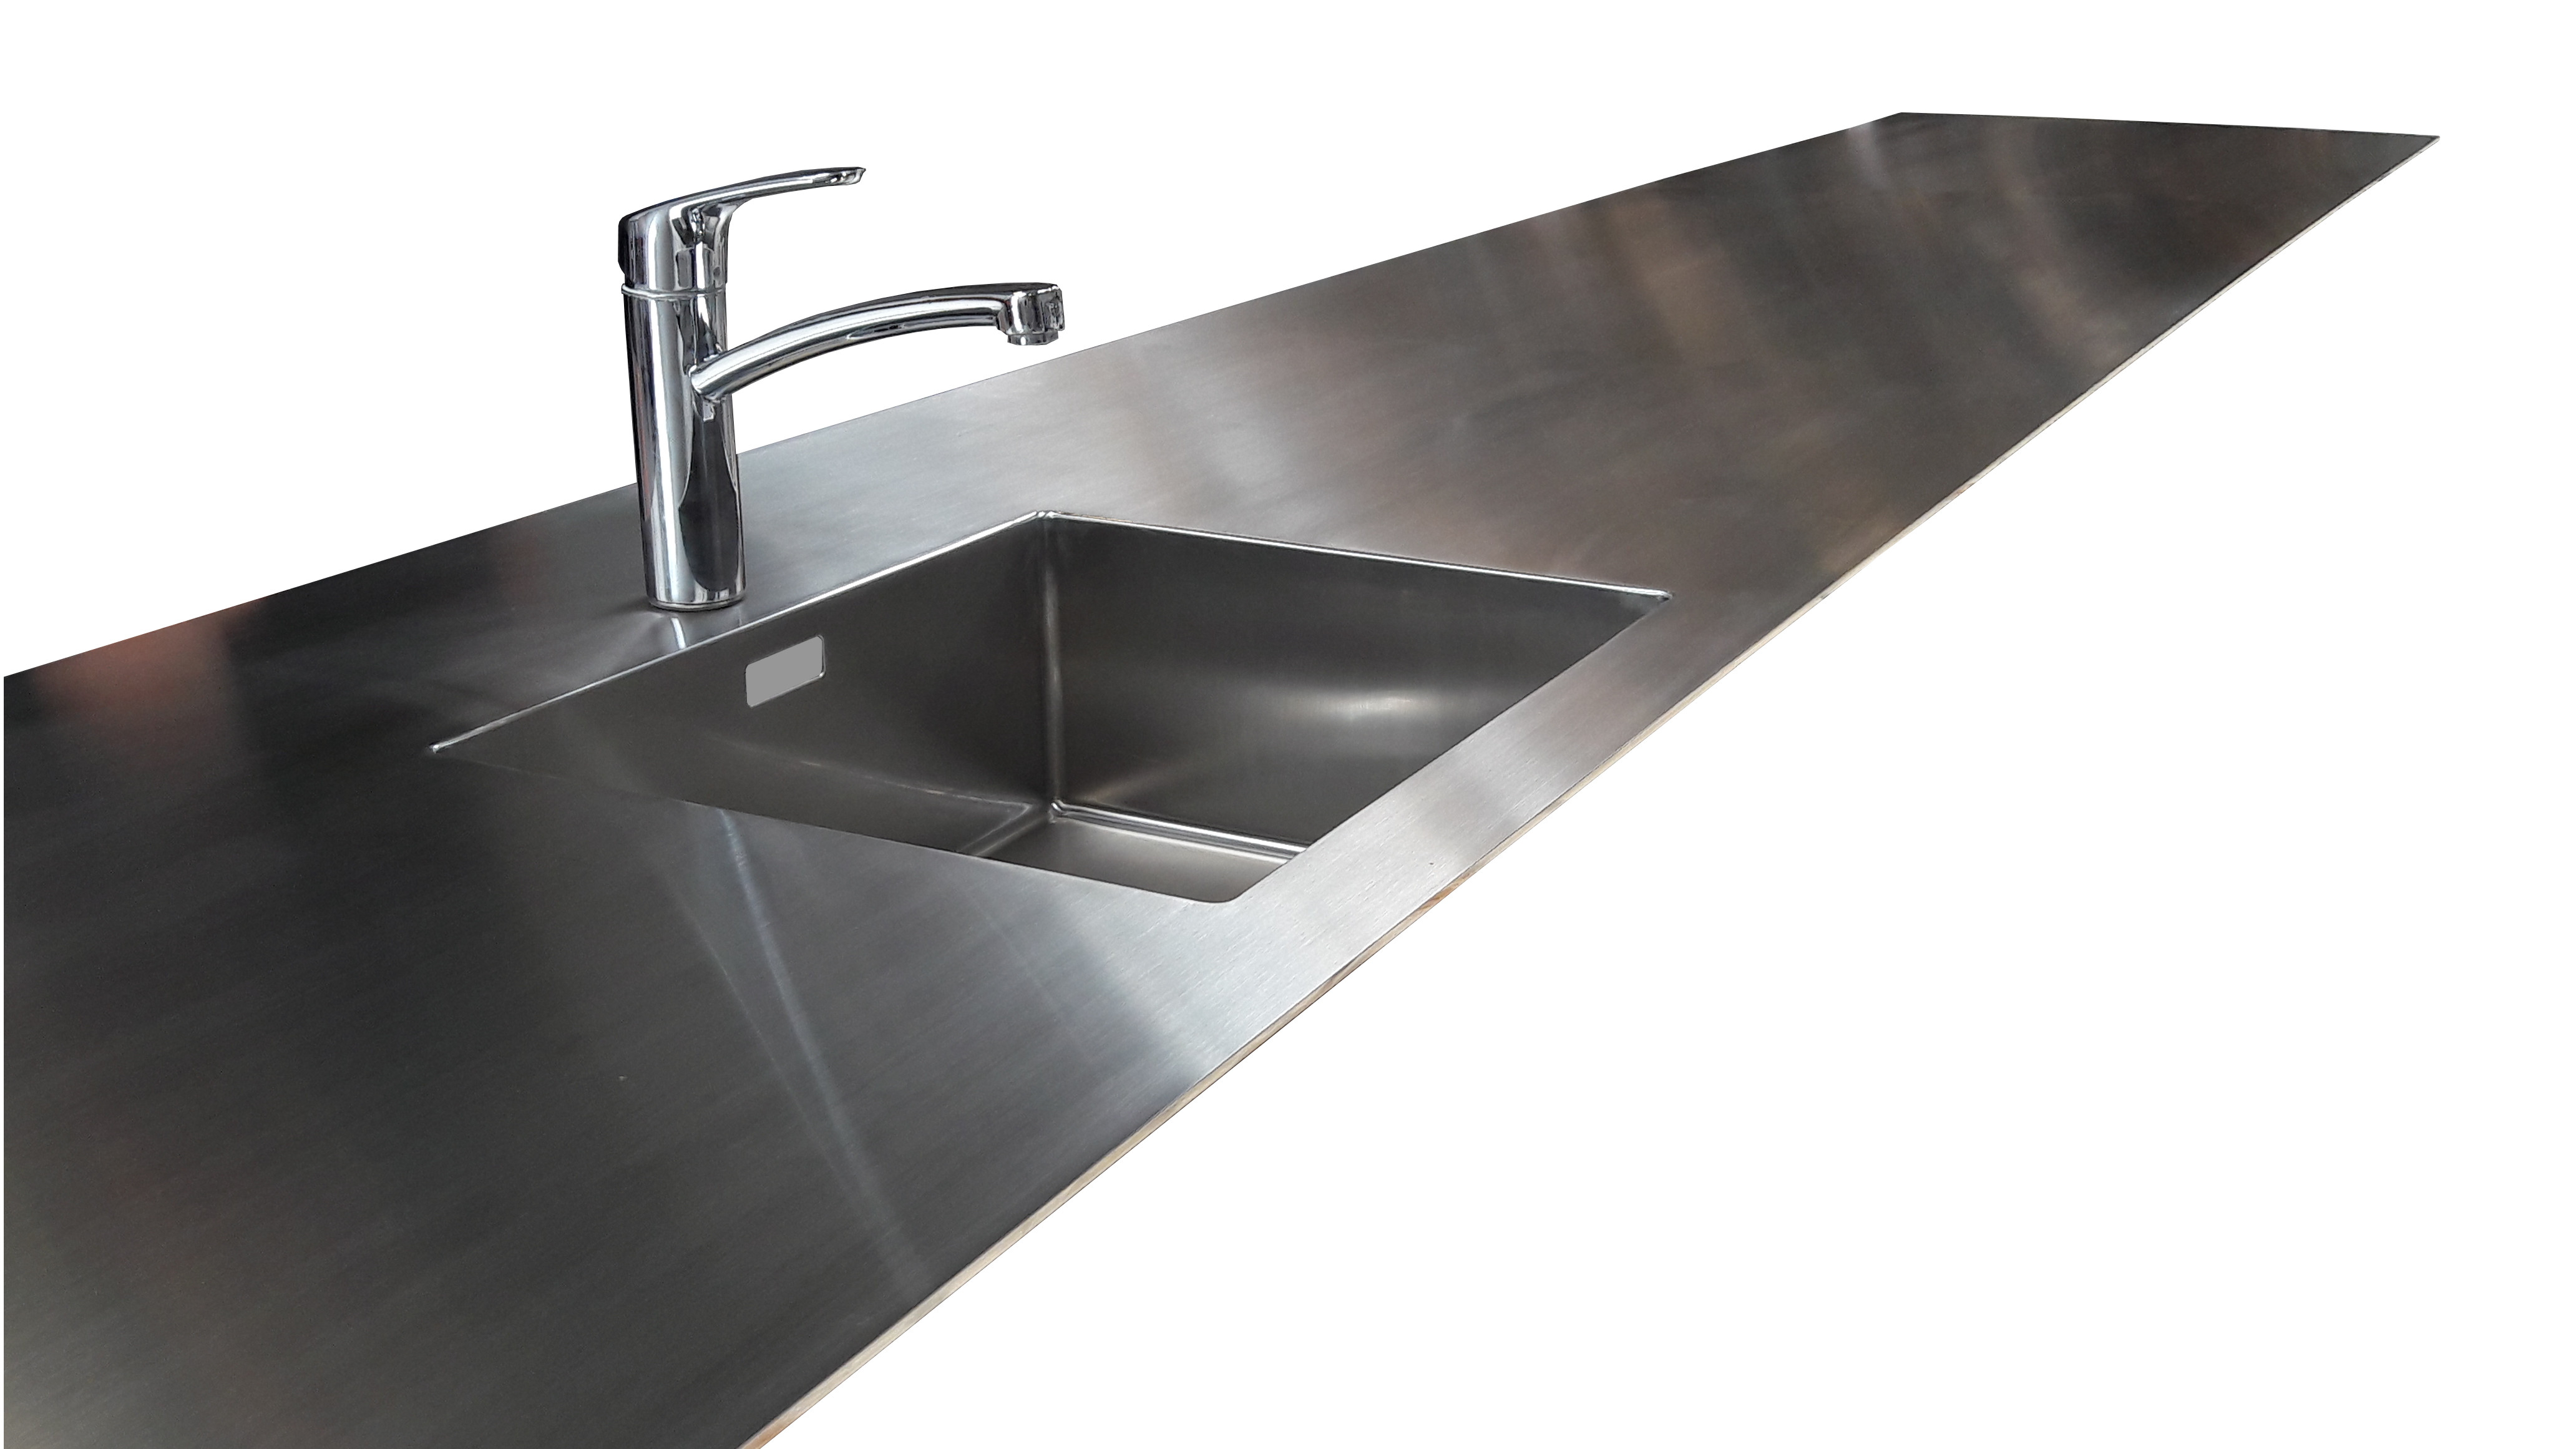 Stålvask Blanco Claron 500 isvejst i massiv rustfast stålbordplade. Tykkelse på bordplade er 5 mm.